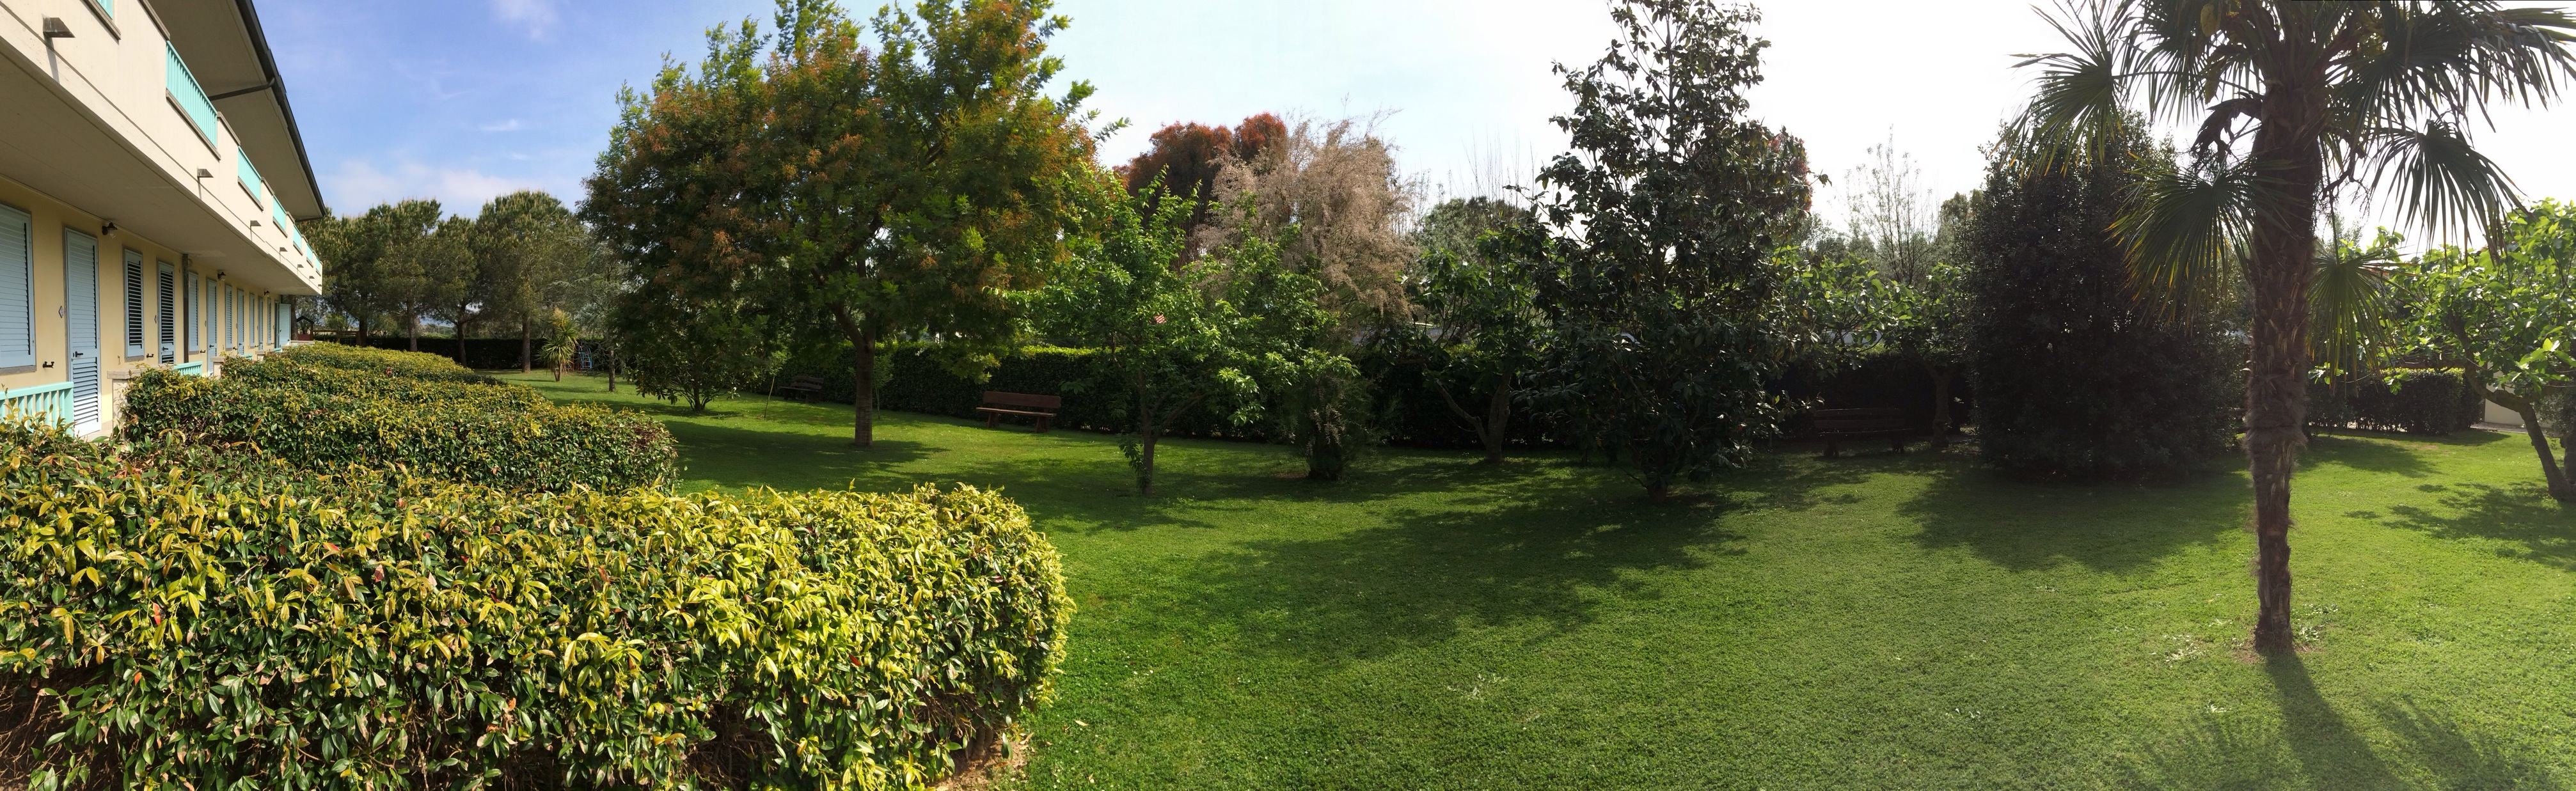 Hotel Residence La Ventola (Vada, Toscana): Prezzi e recensioni